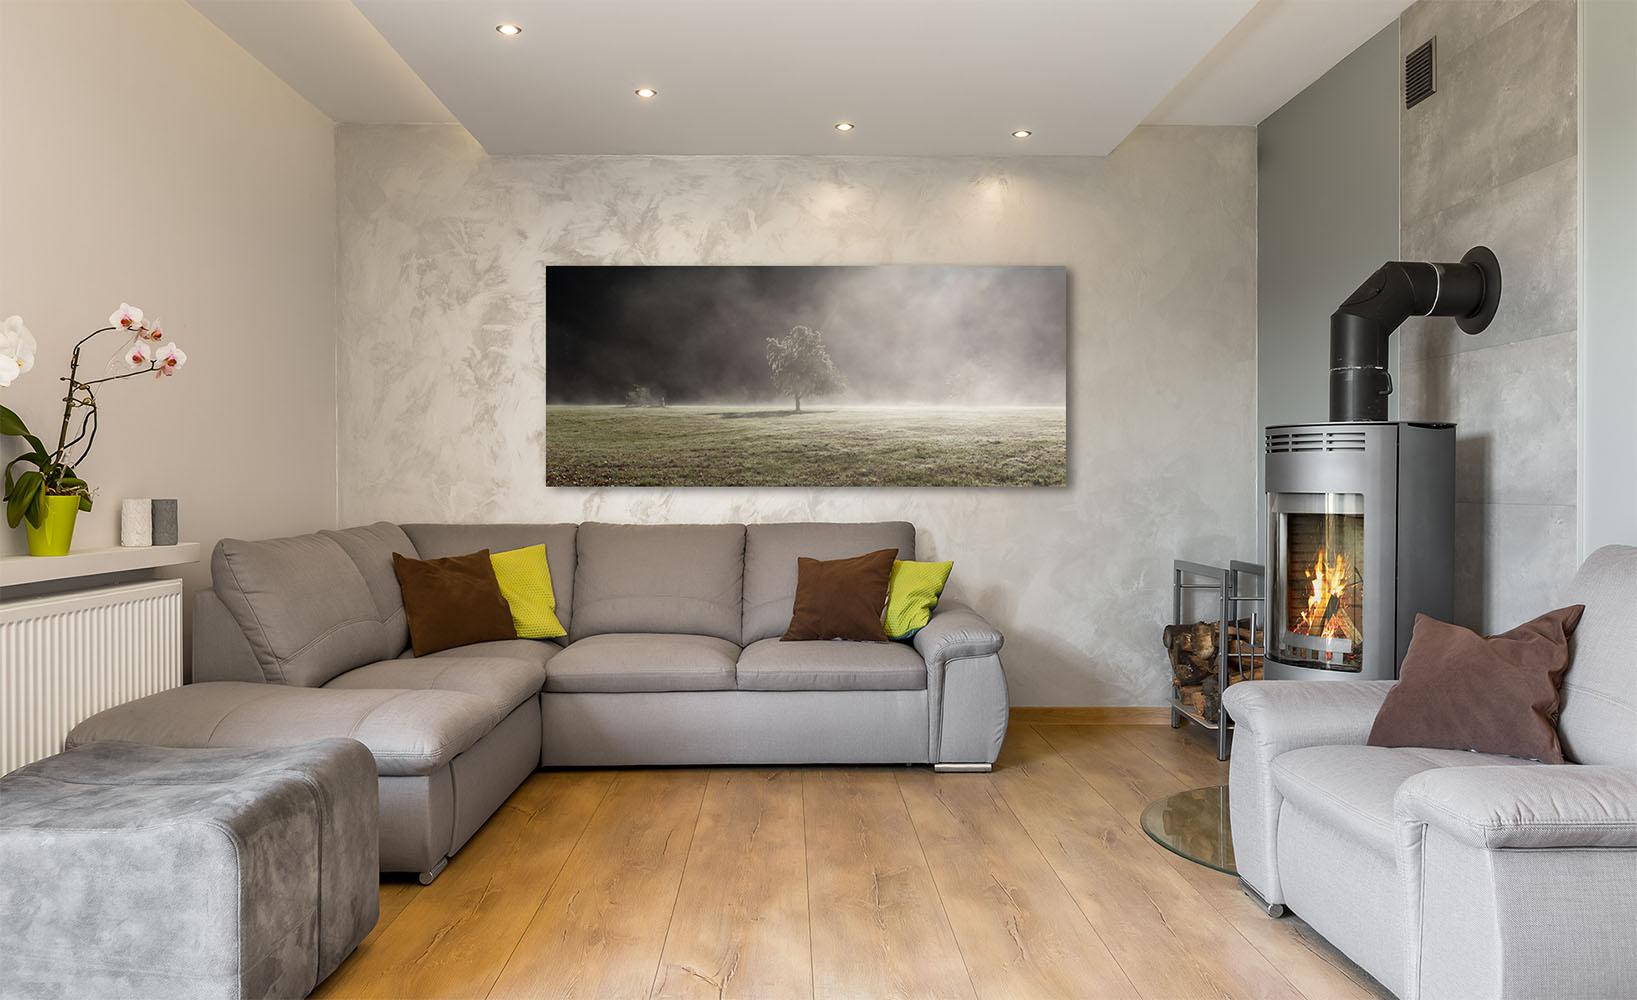 Washington Fine Art Tree Rainforest Mist Fog Luxury home decor interior design Michael Andrejkow